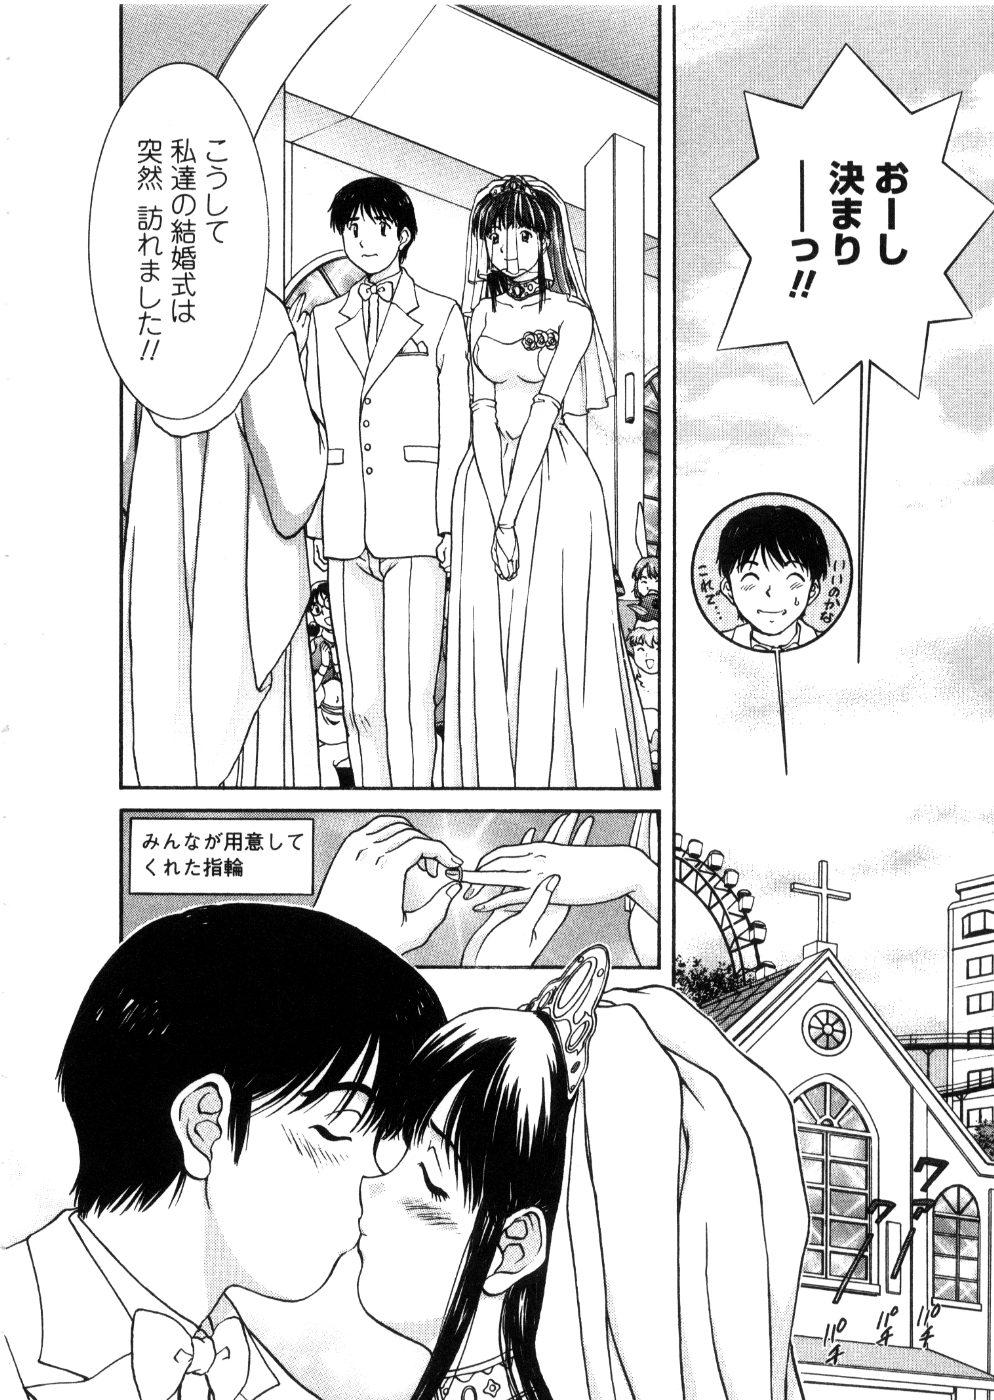 Oneechan-tachi ga Yatte Kuru 03 183